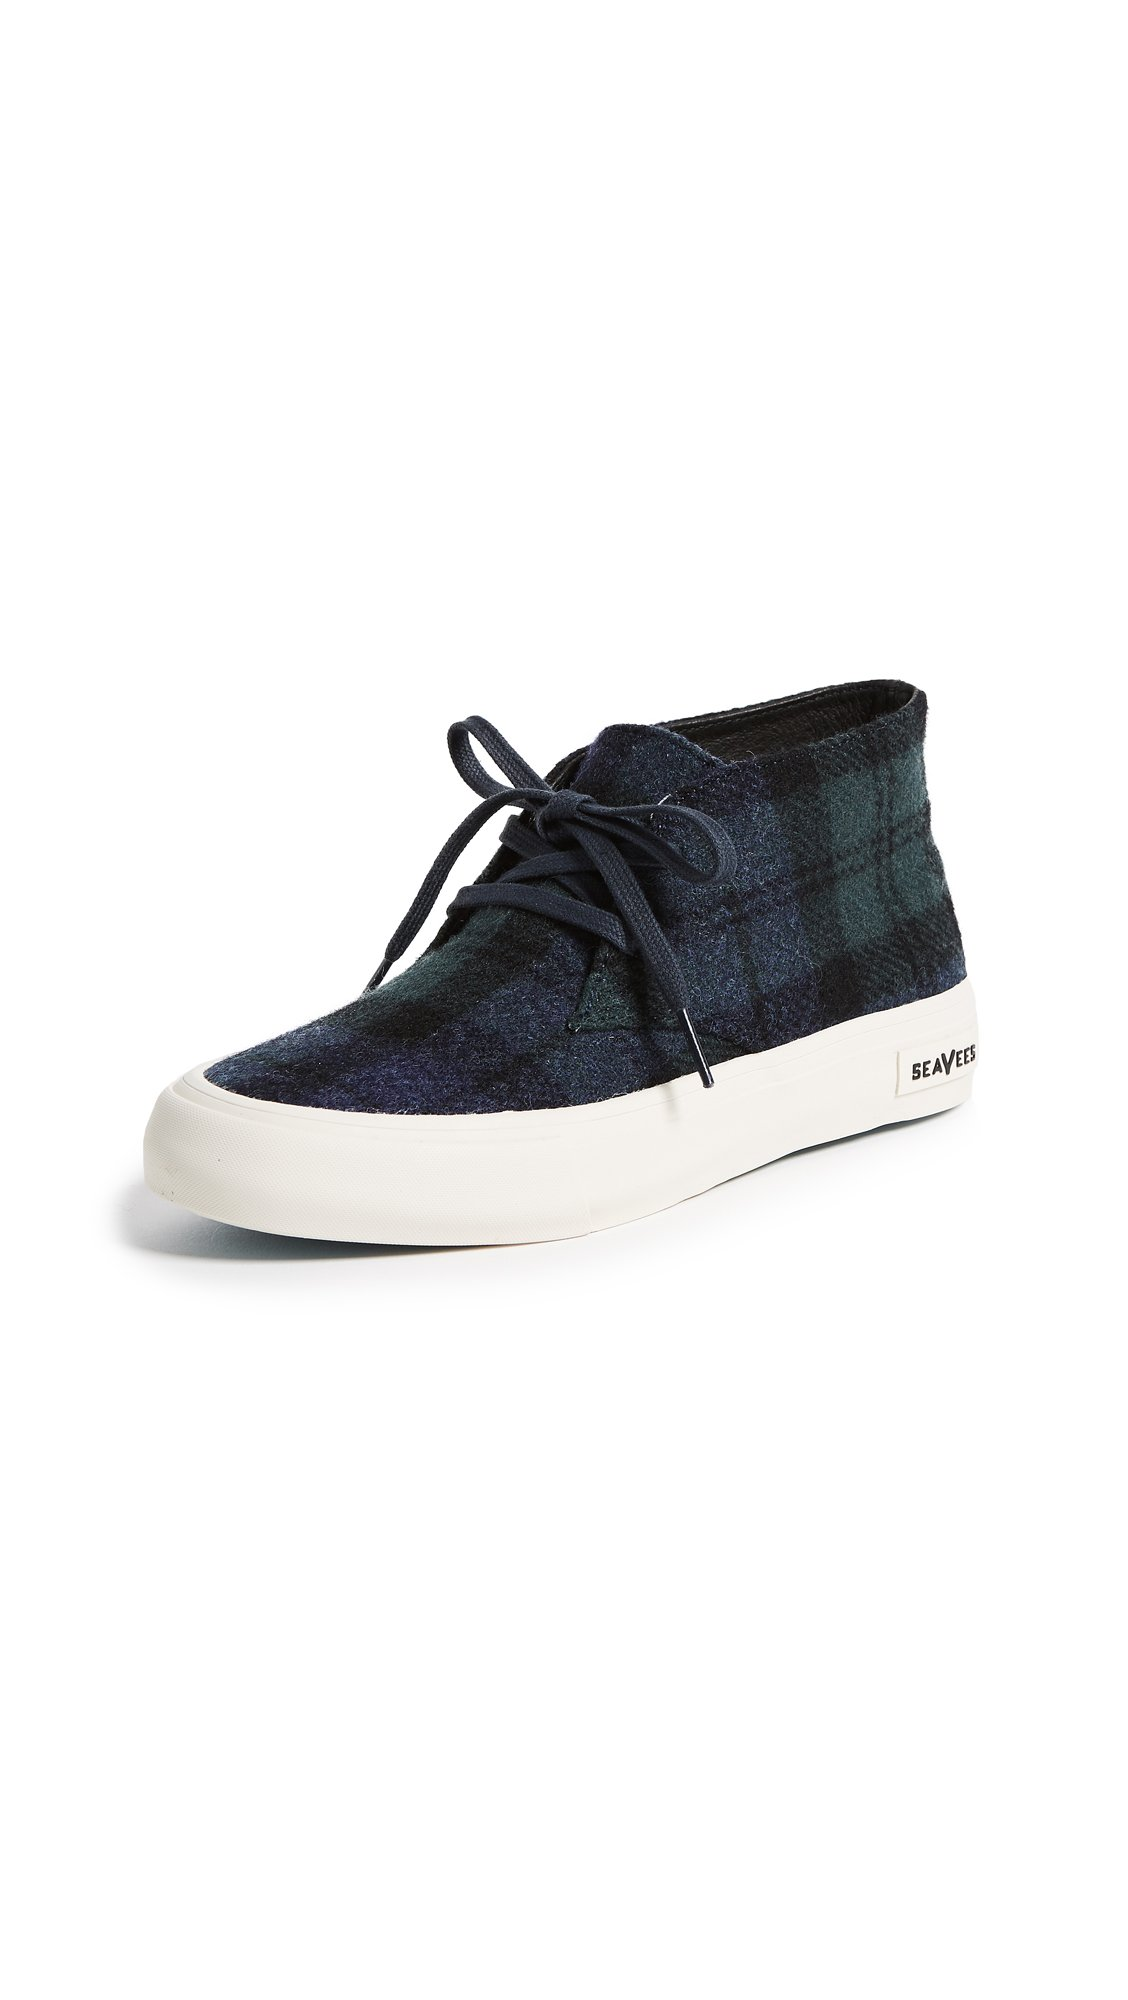 SeaVees Women's Maslon Desert Boot Sneakers, Blackwatch Plaid, 7.5 B(M) US